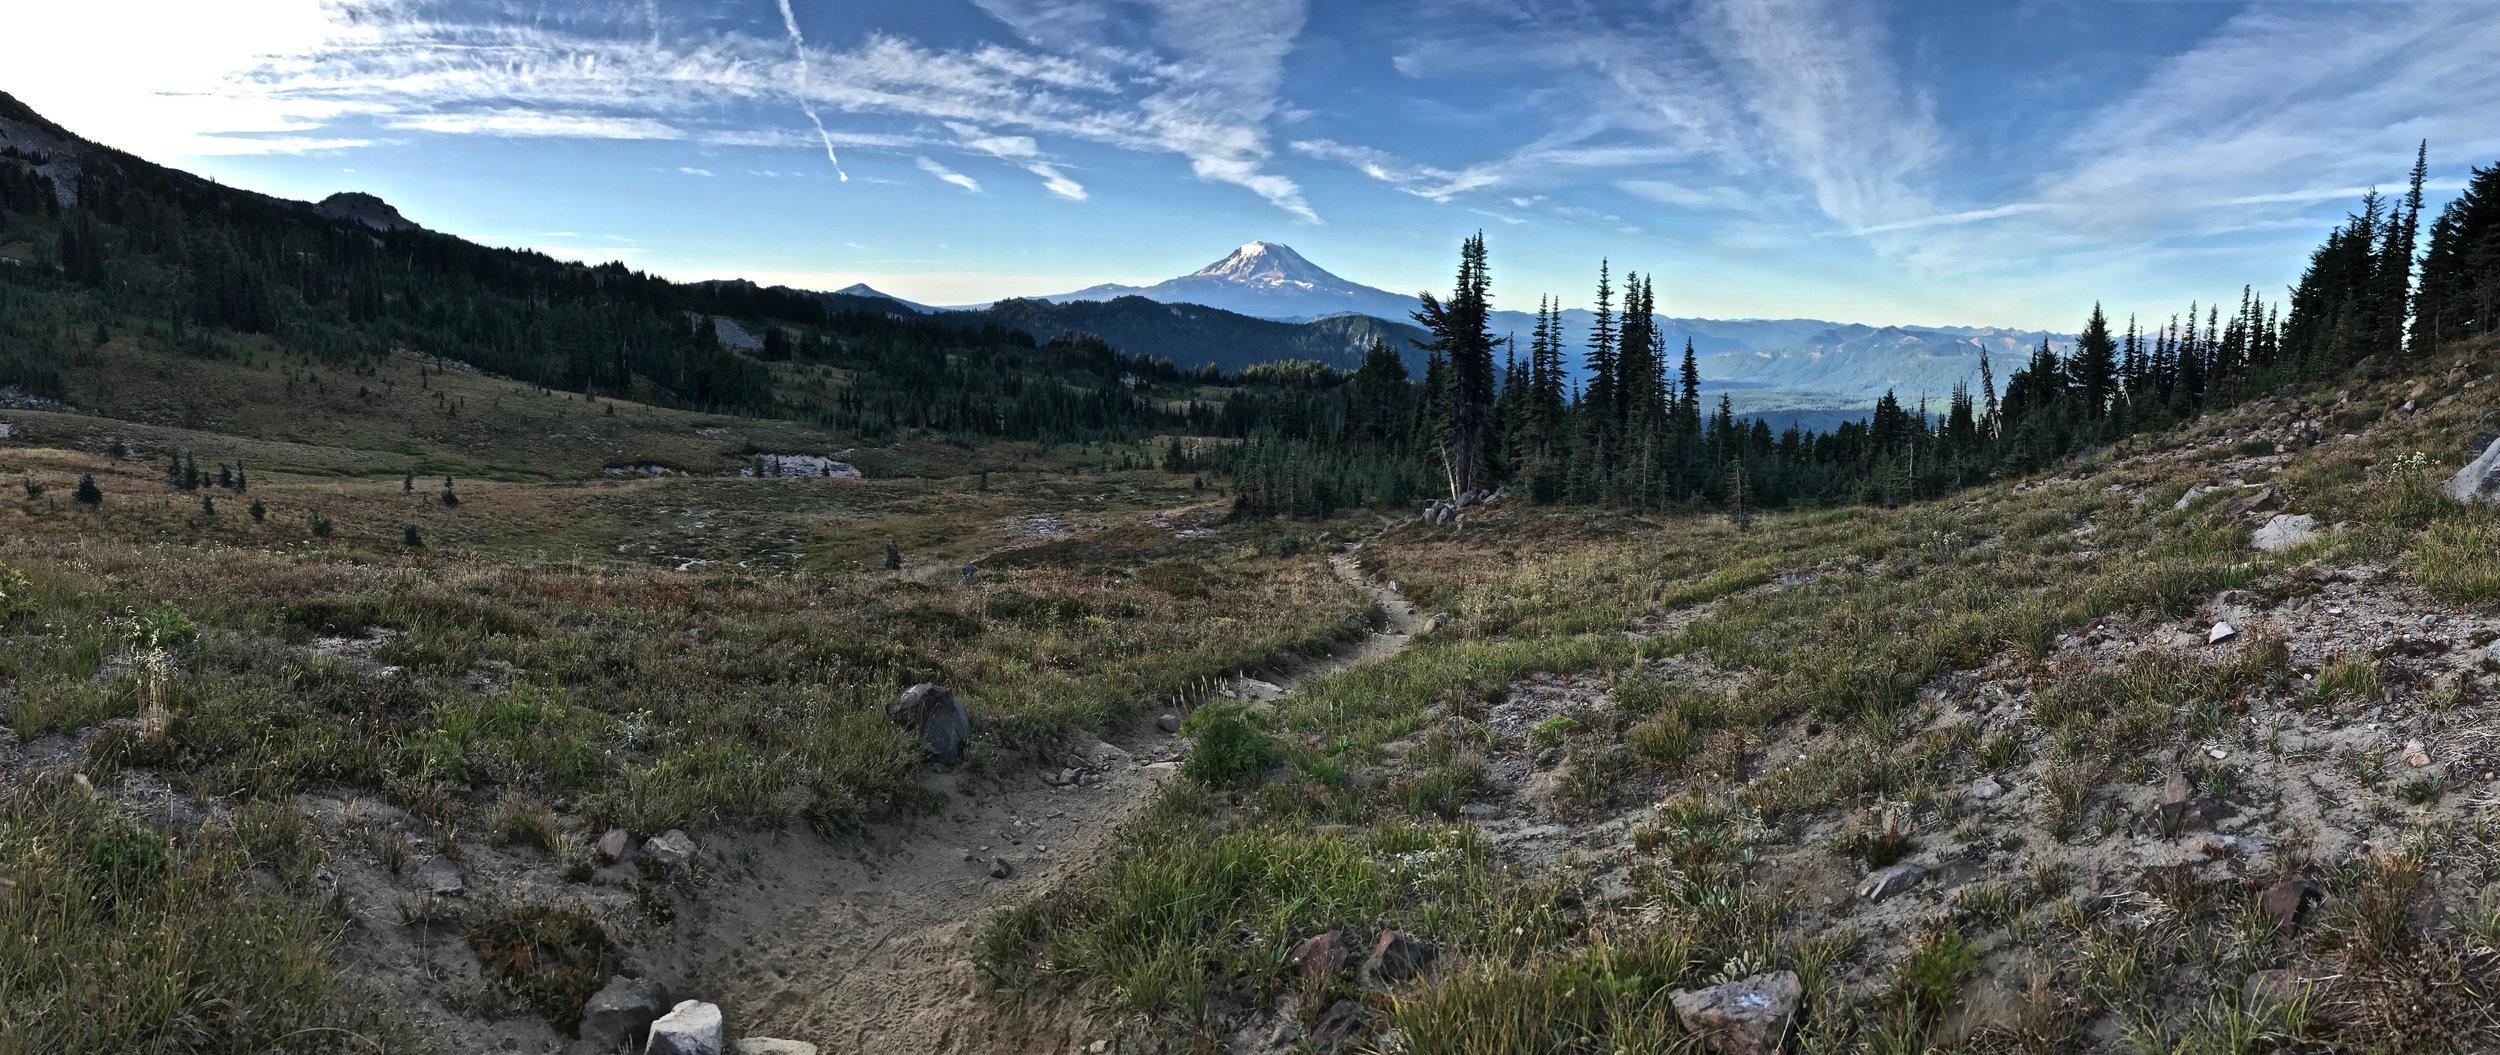 Following the trail to Mt. Rainier!